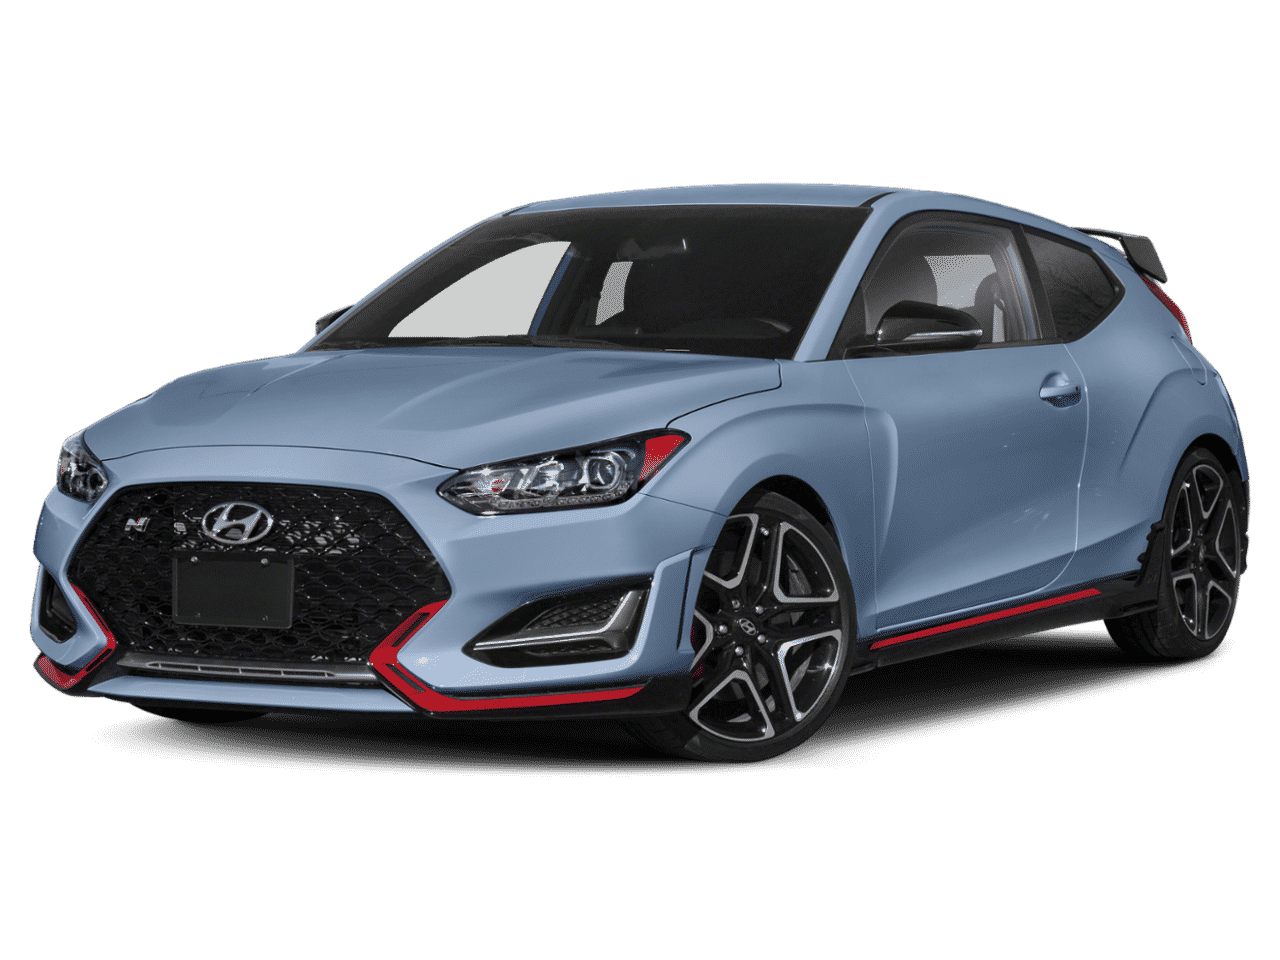 2020 Hyundai Veloster Dealer Pricing Report